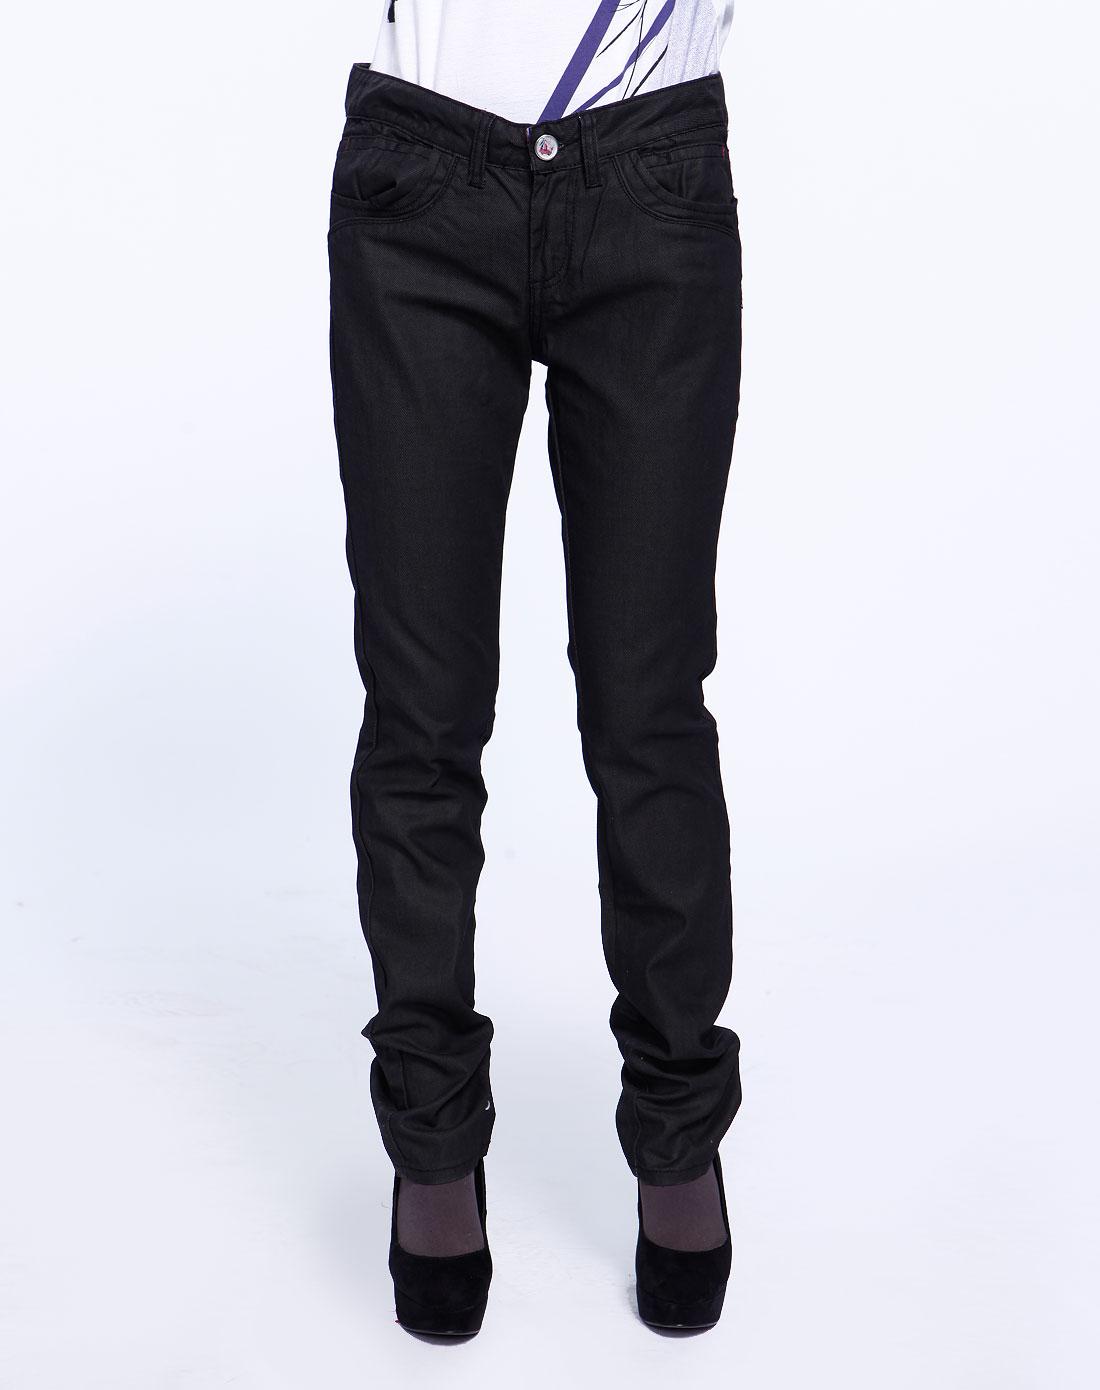 fox女款黑色休闲牛仔长裤